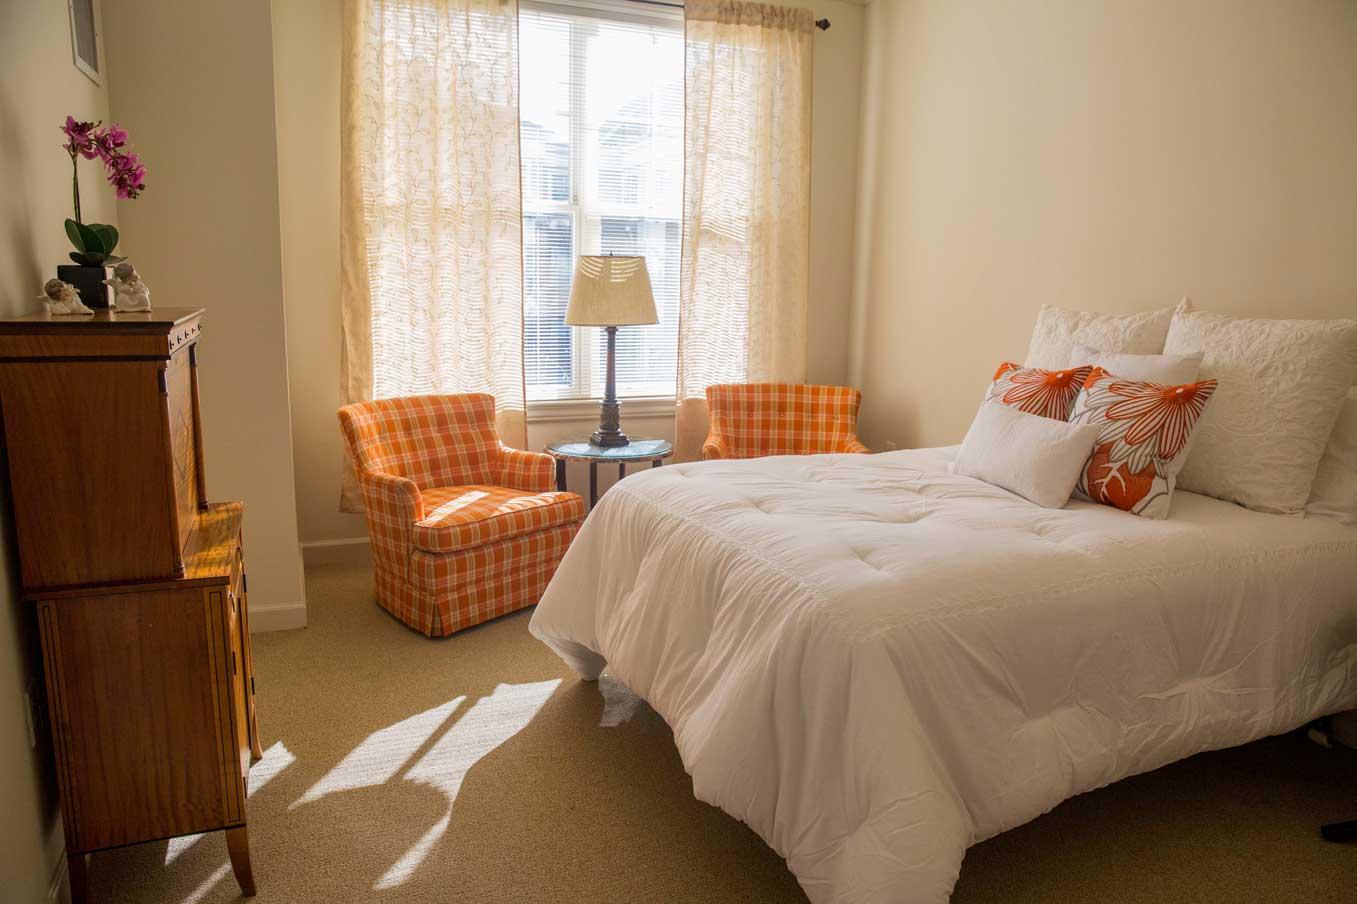 Grand Oaks memory care apartments